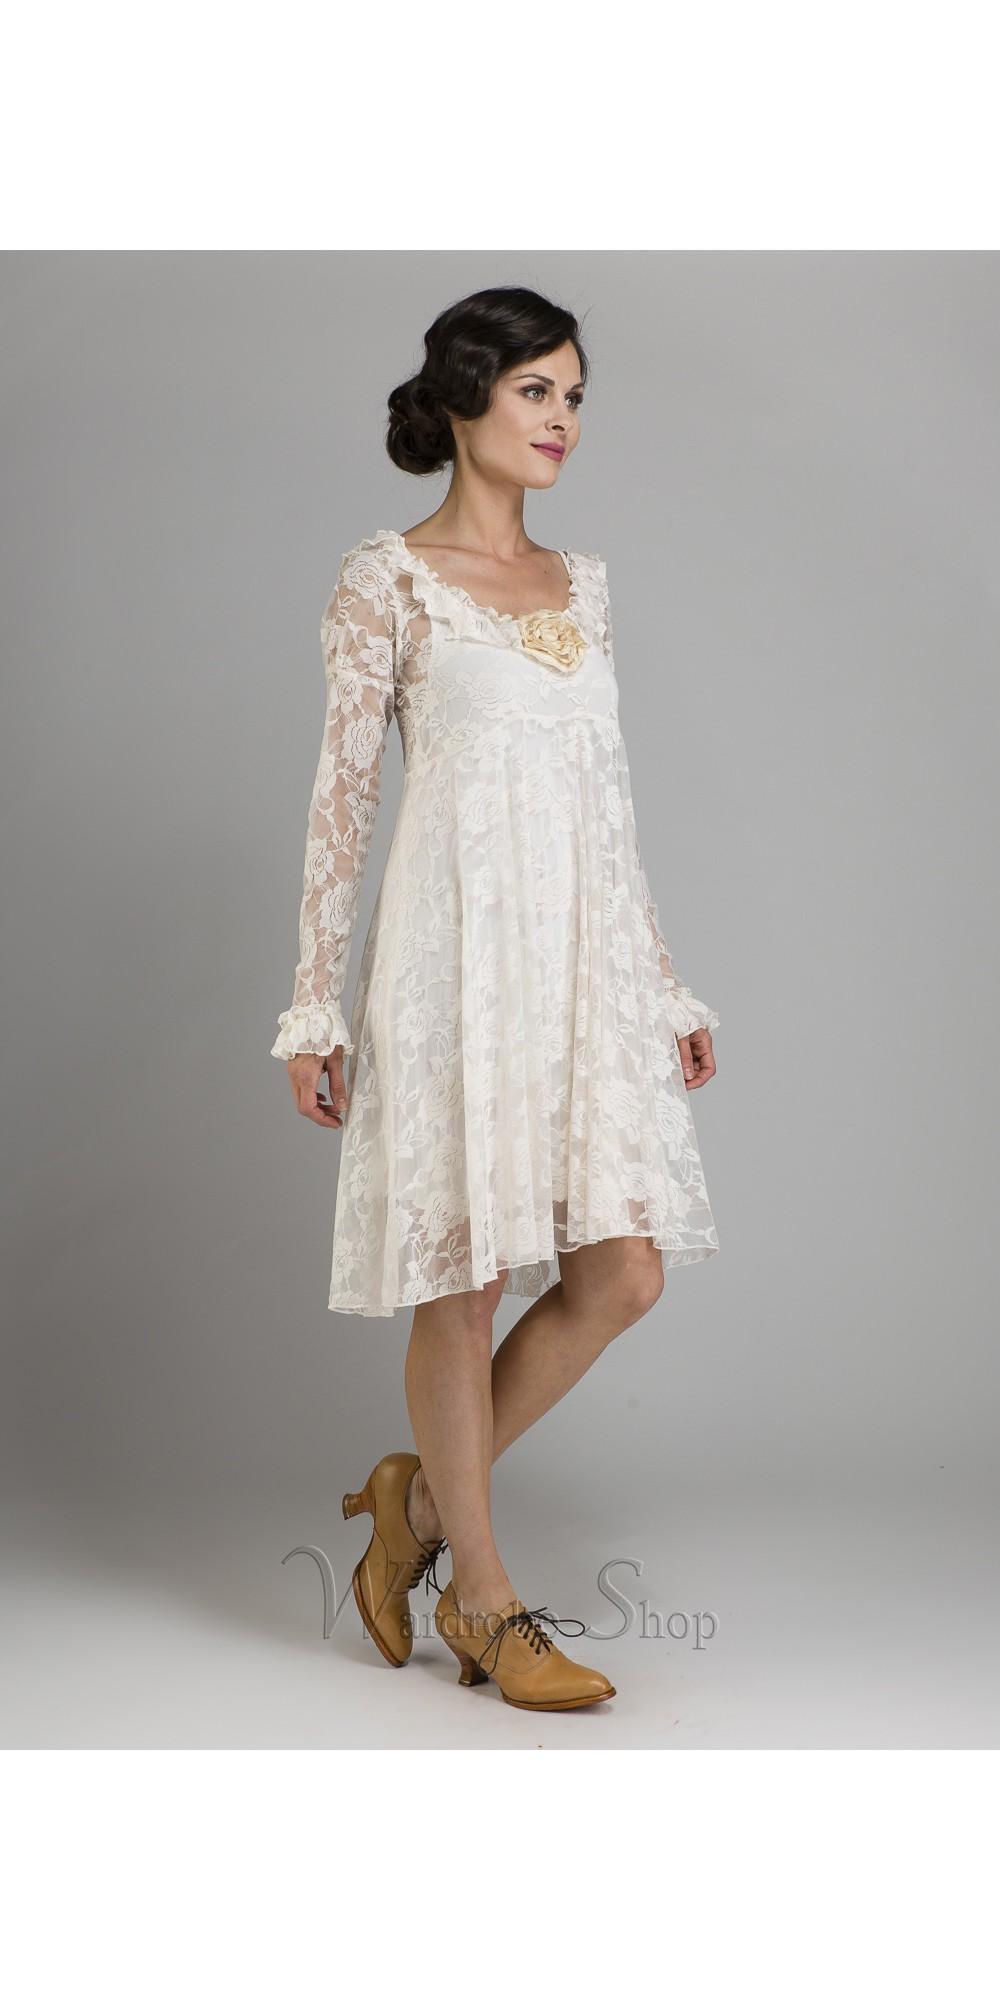 631c5b770ab Camelot Romantic Flitry Dress by Marrika Nakk